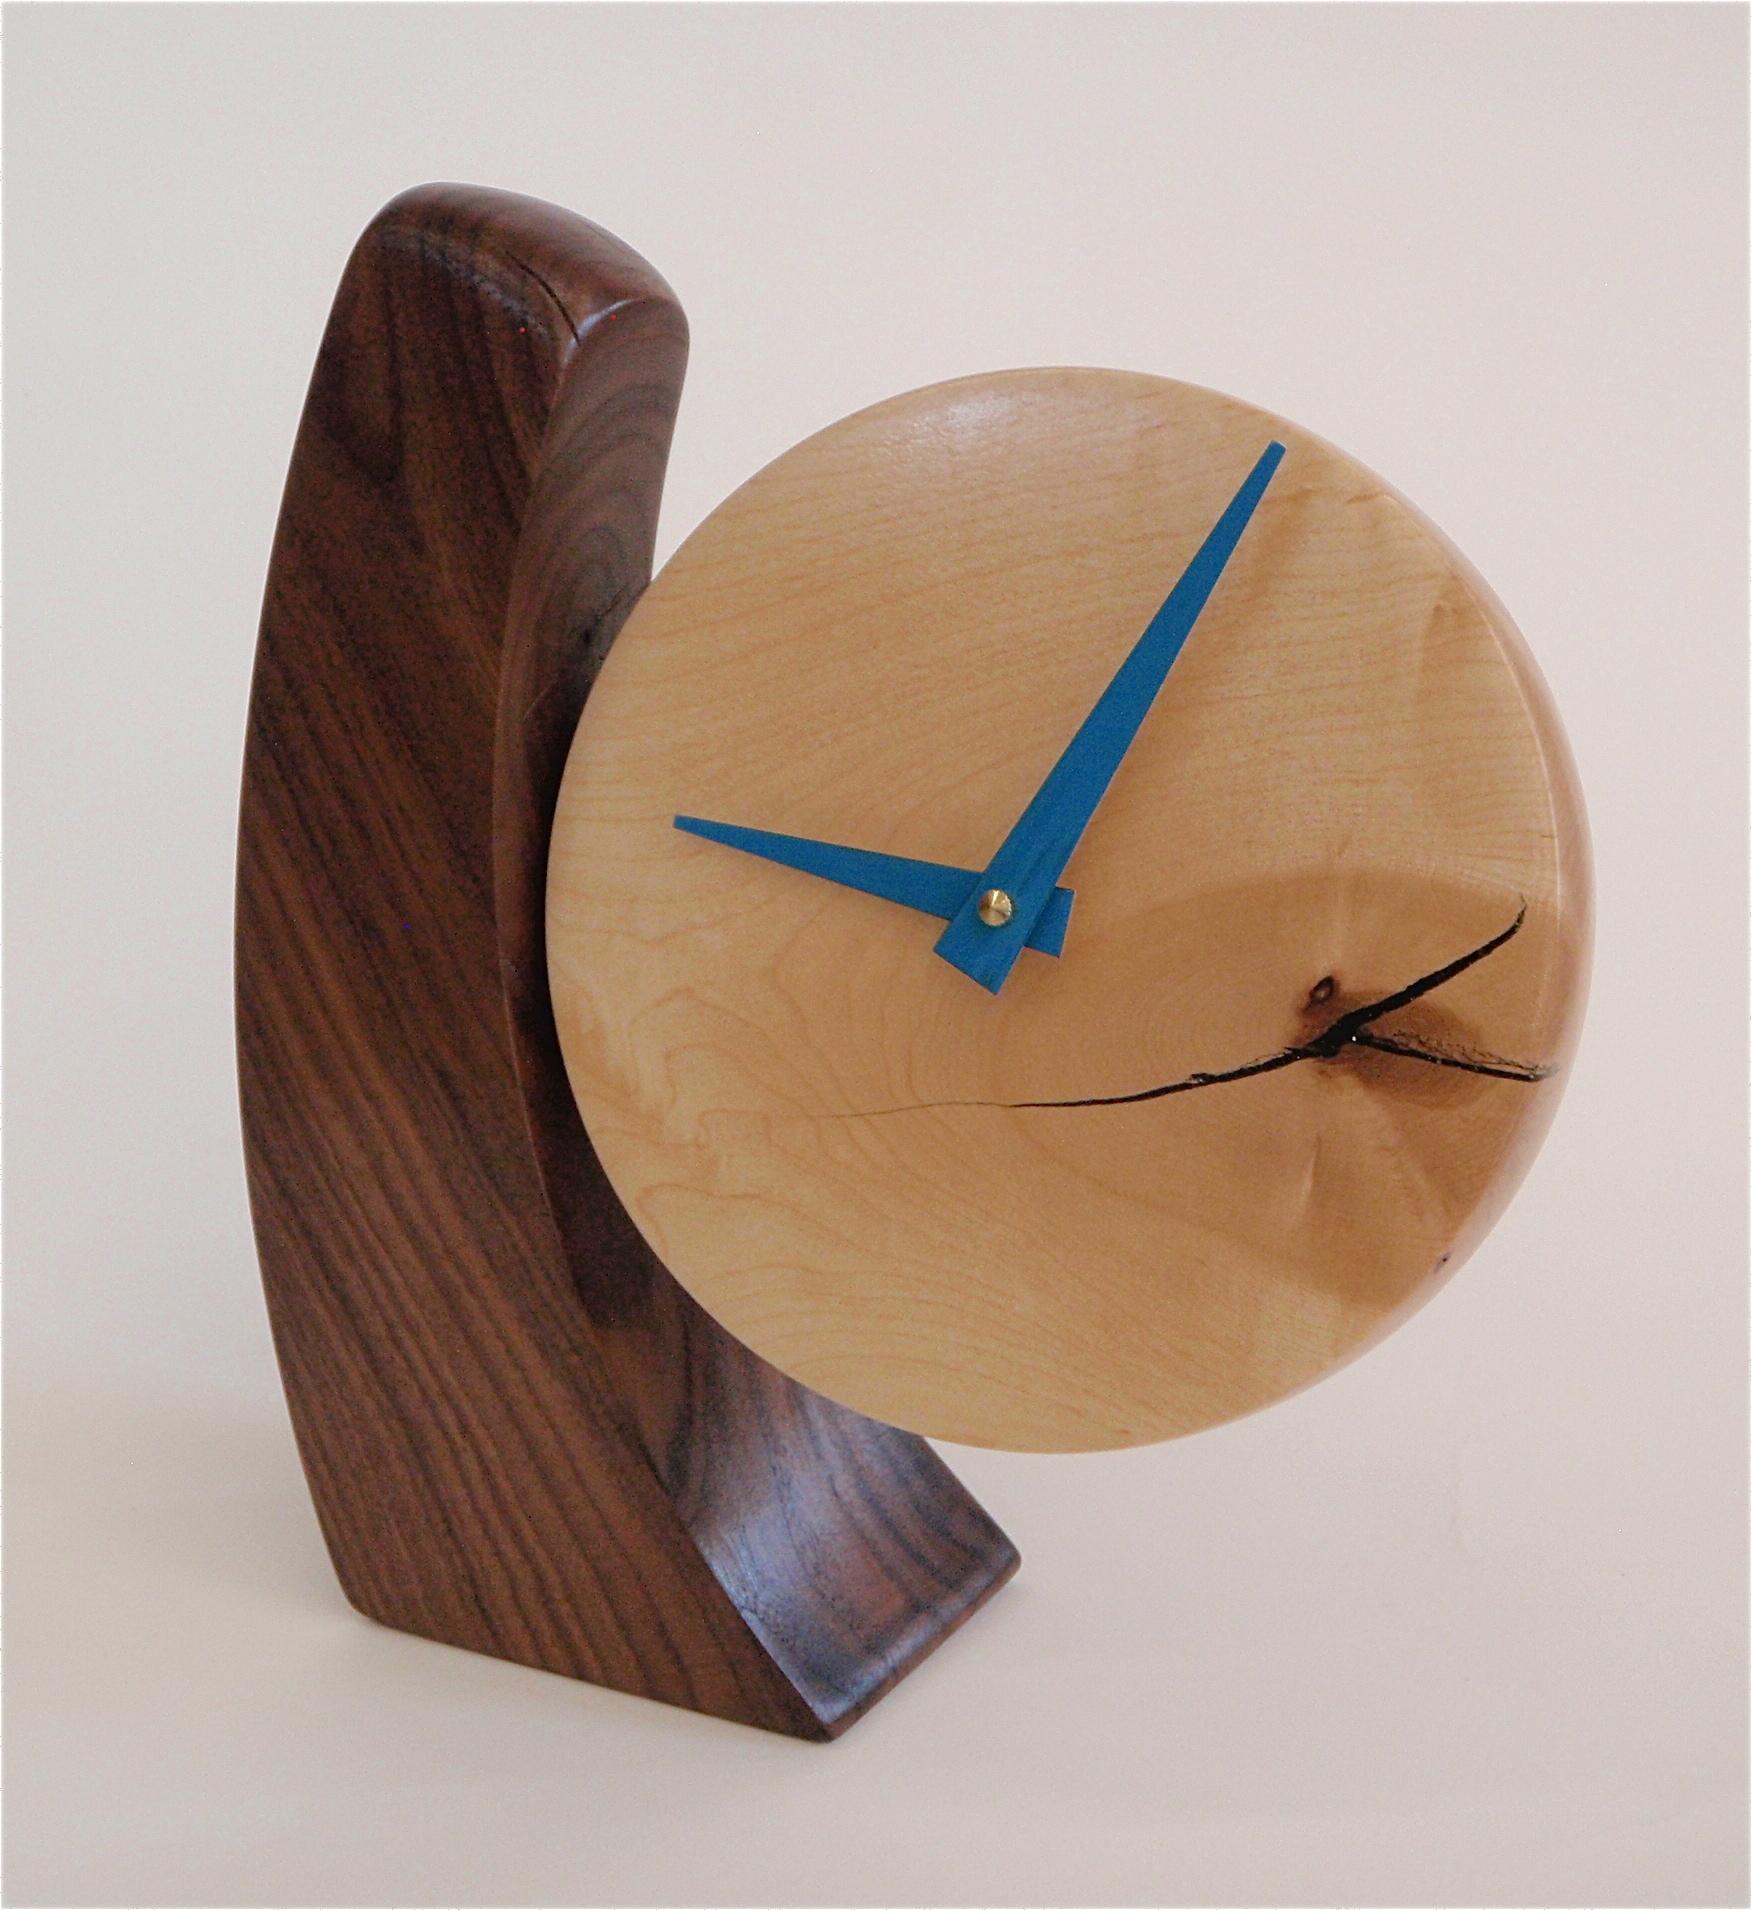 Adjustable desk clock 02